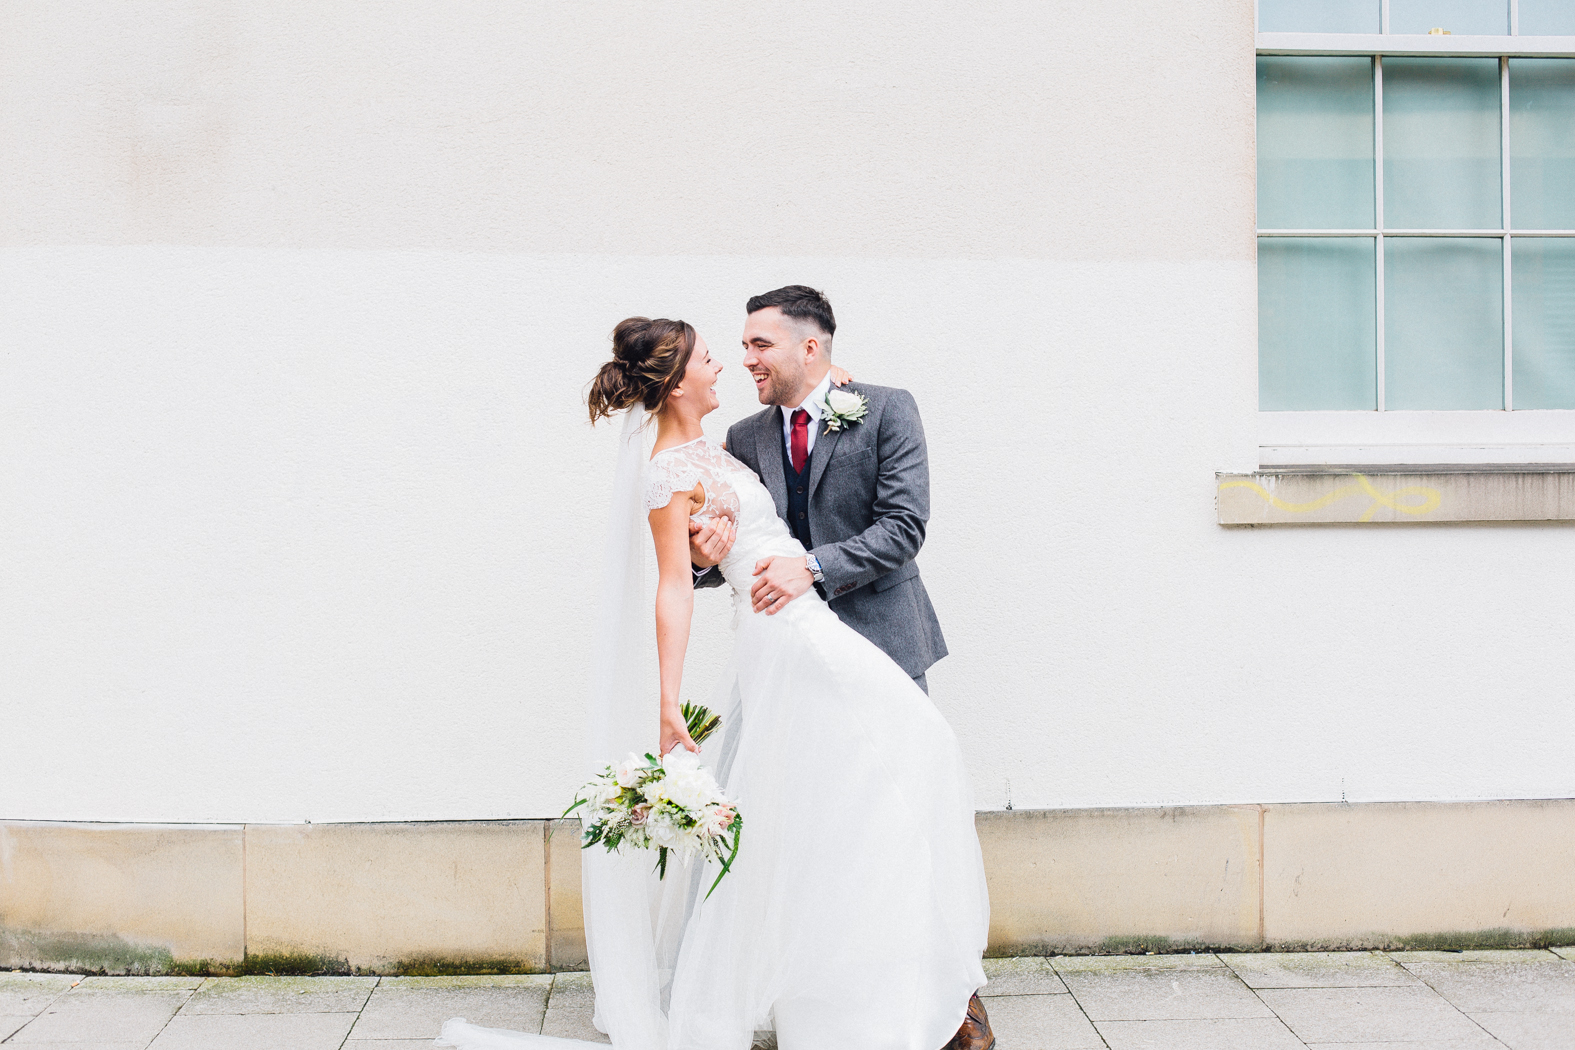 Halfpenny london wedding dress for an industrial wedding in sheffield bride groom ombrellifo Images